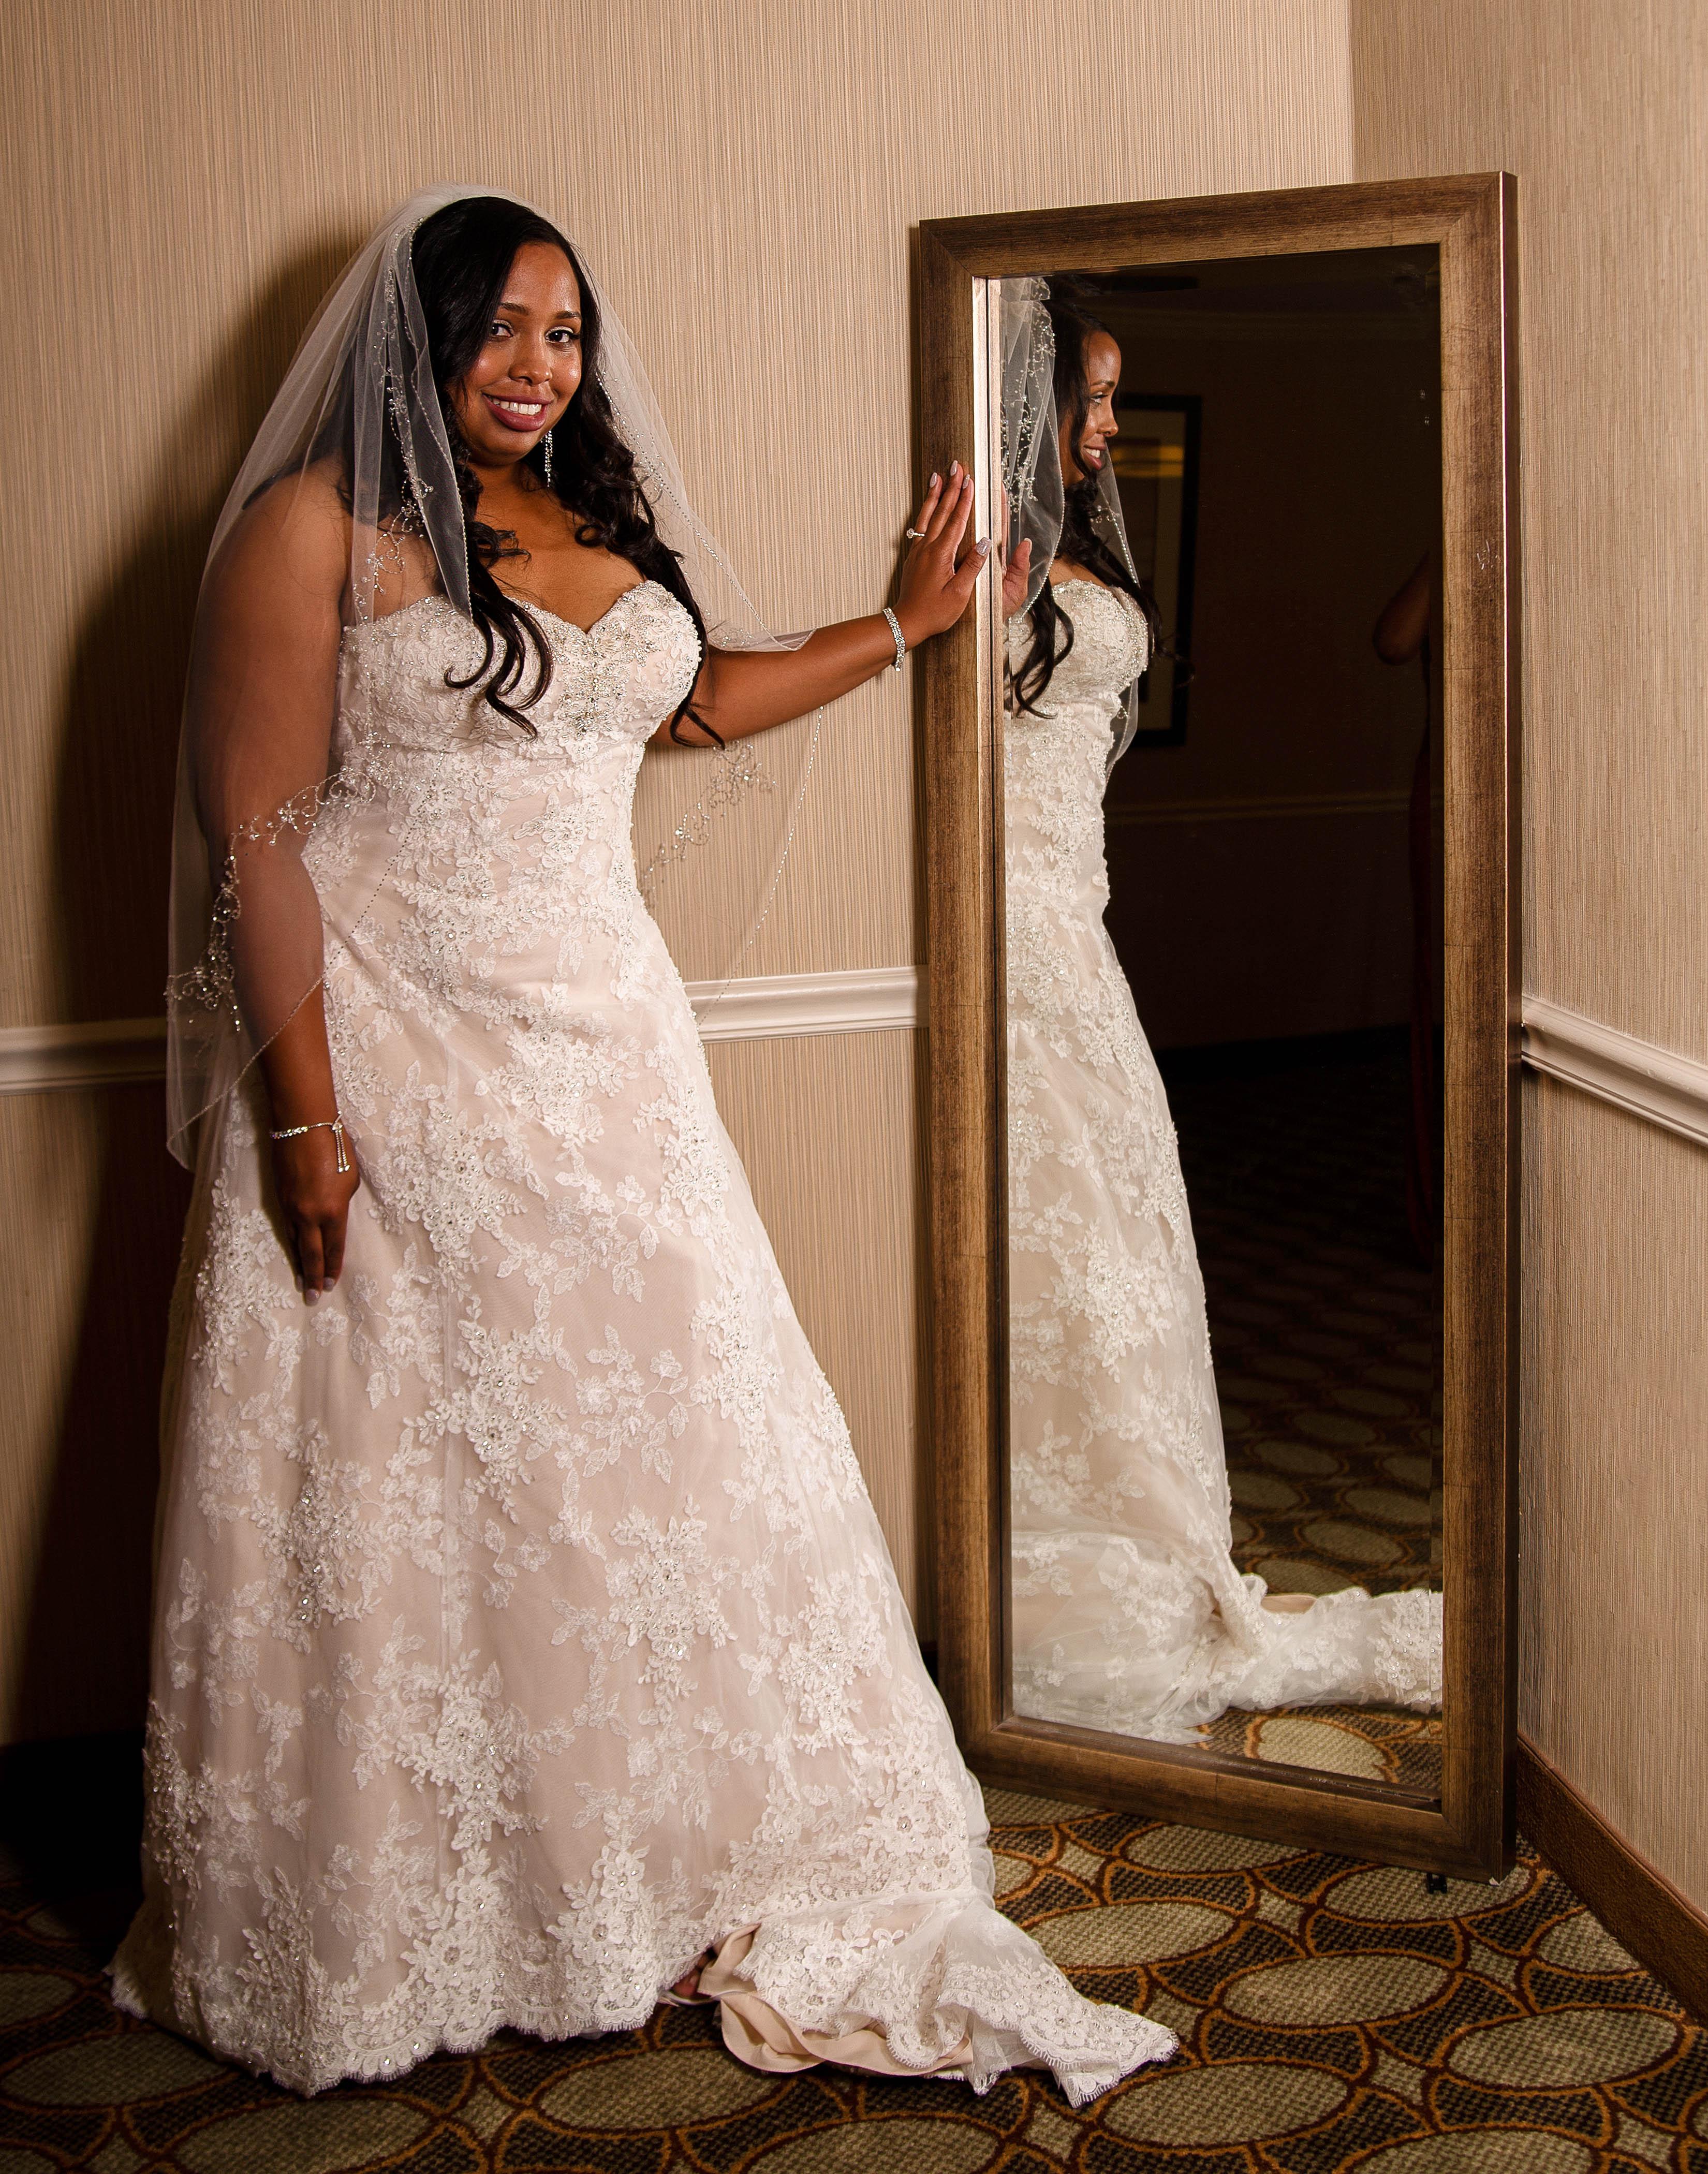 CPH_High-Res-Gaither Wedding2018-297